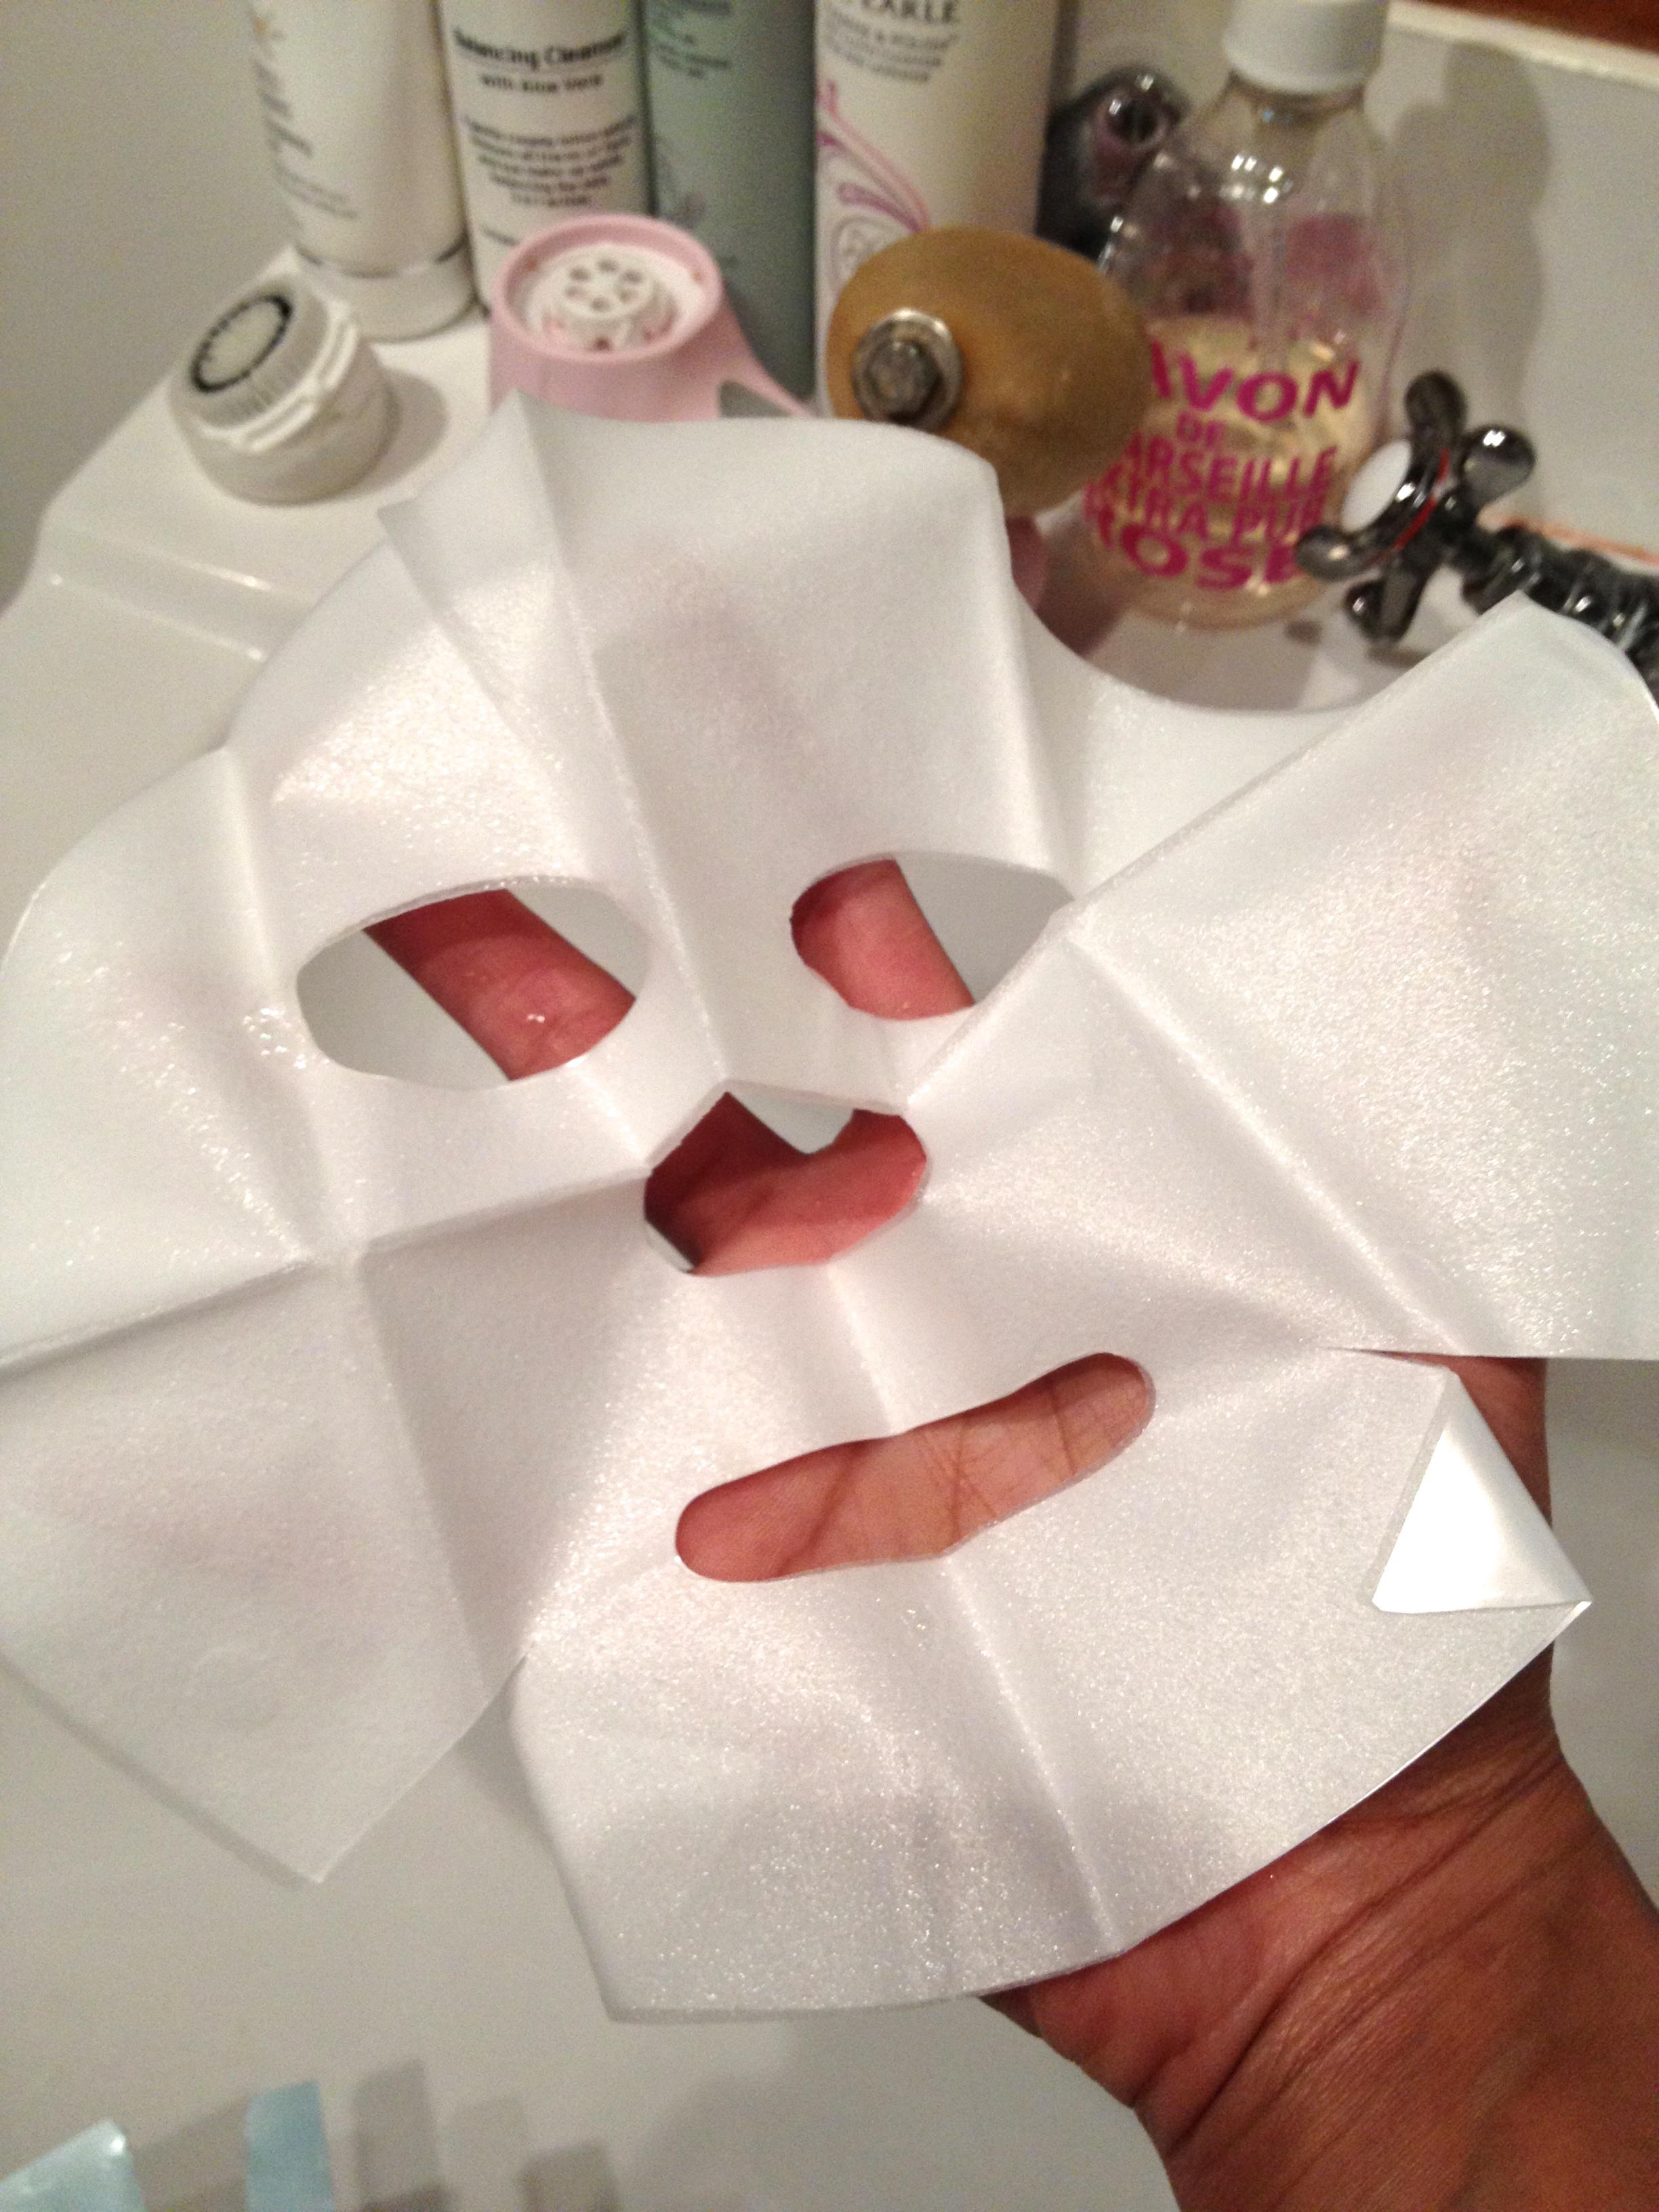 Fabric Face Mask: Cloth Face Masks